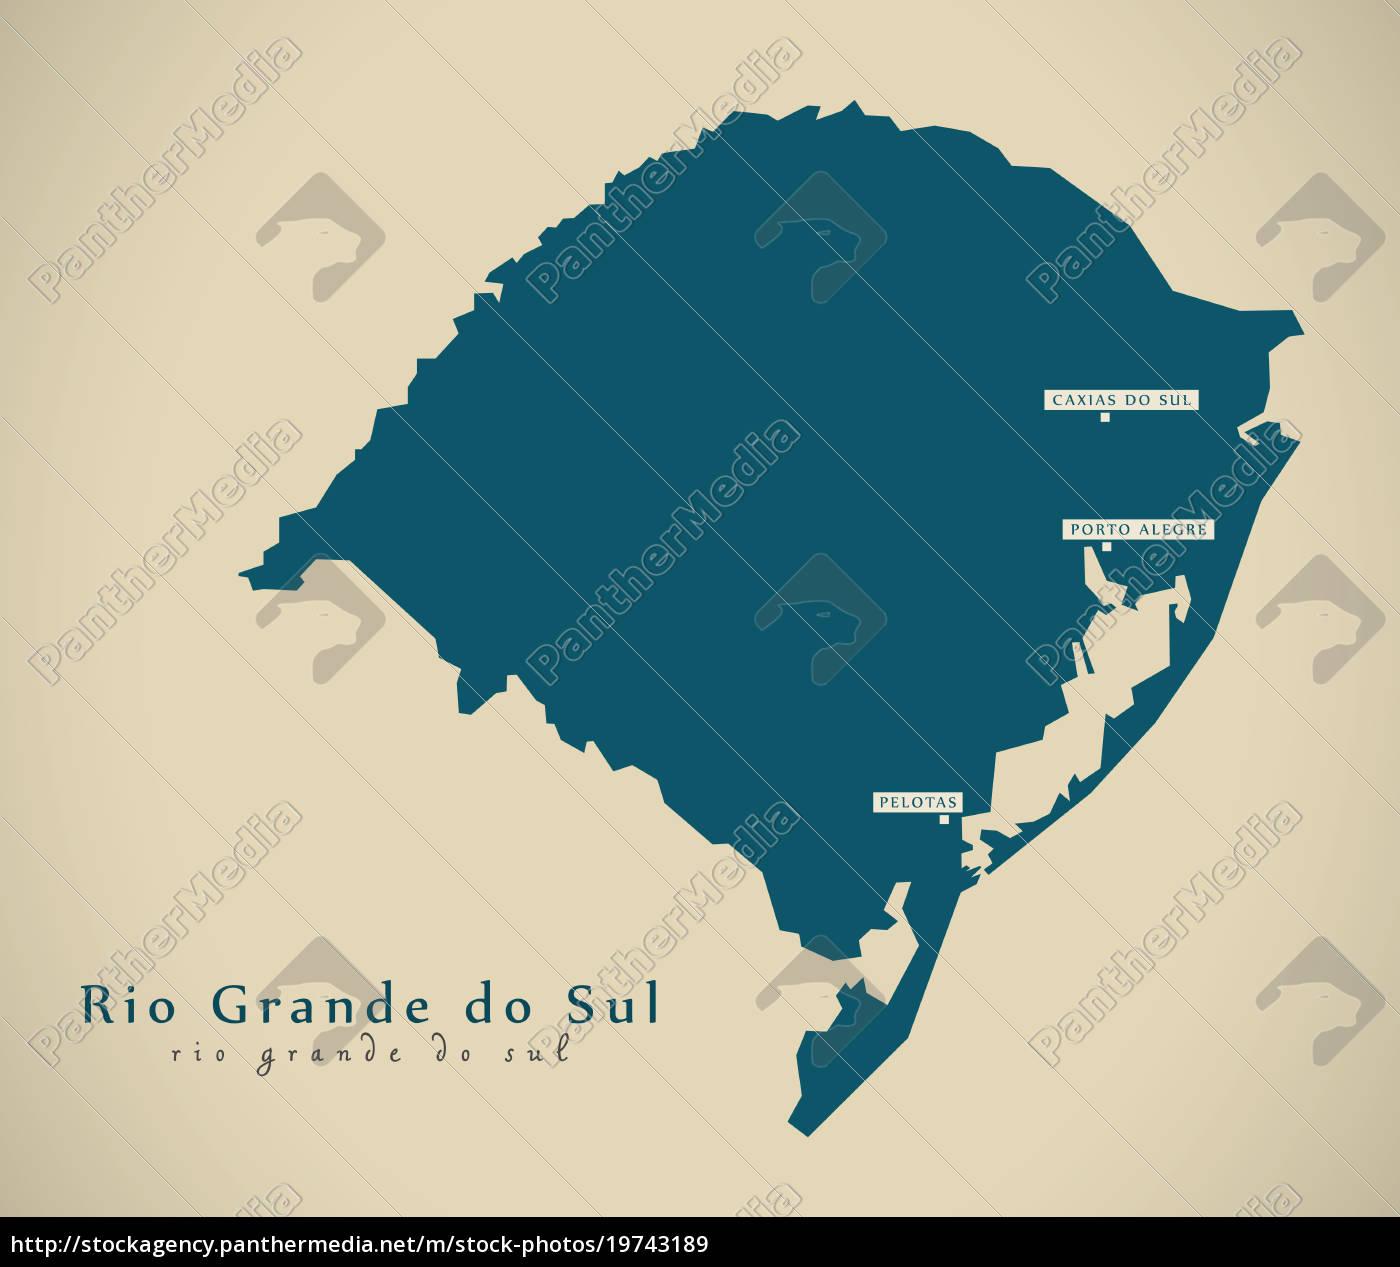 Stockfoto 19743189 - moderne karte rio grande do sul br brasilien  illustration